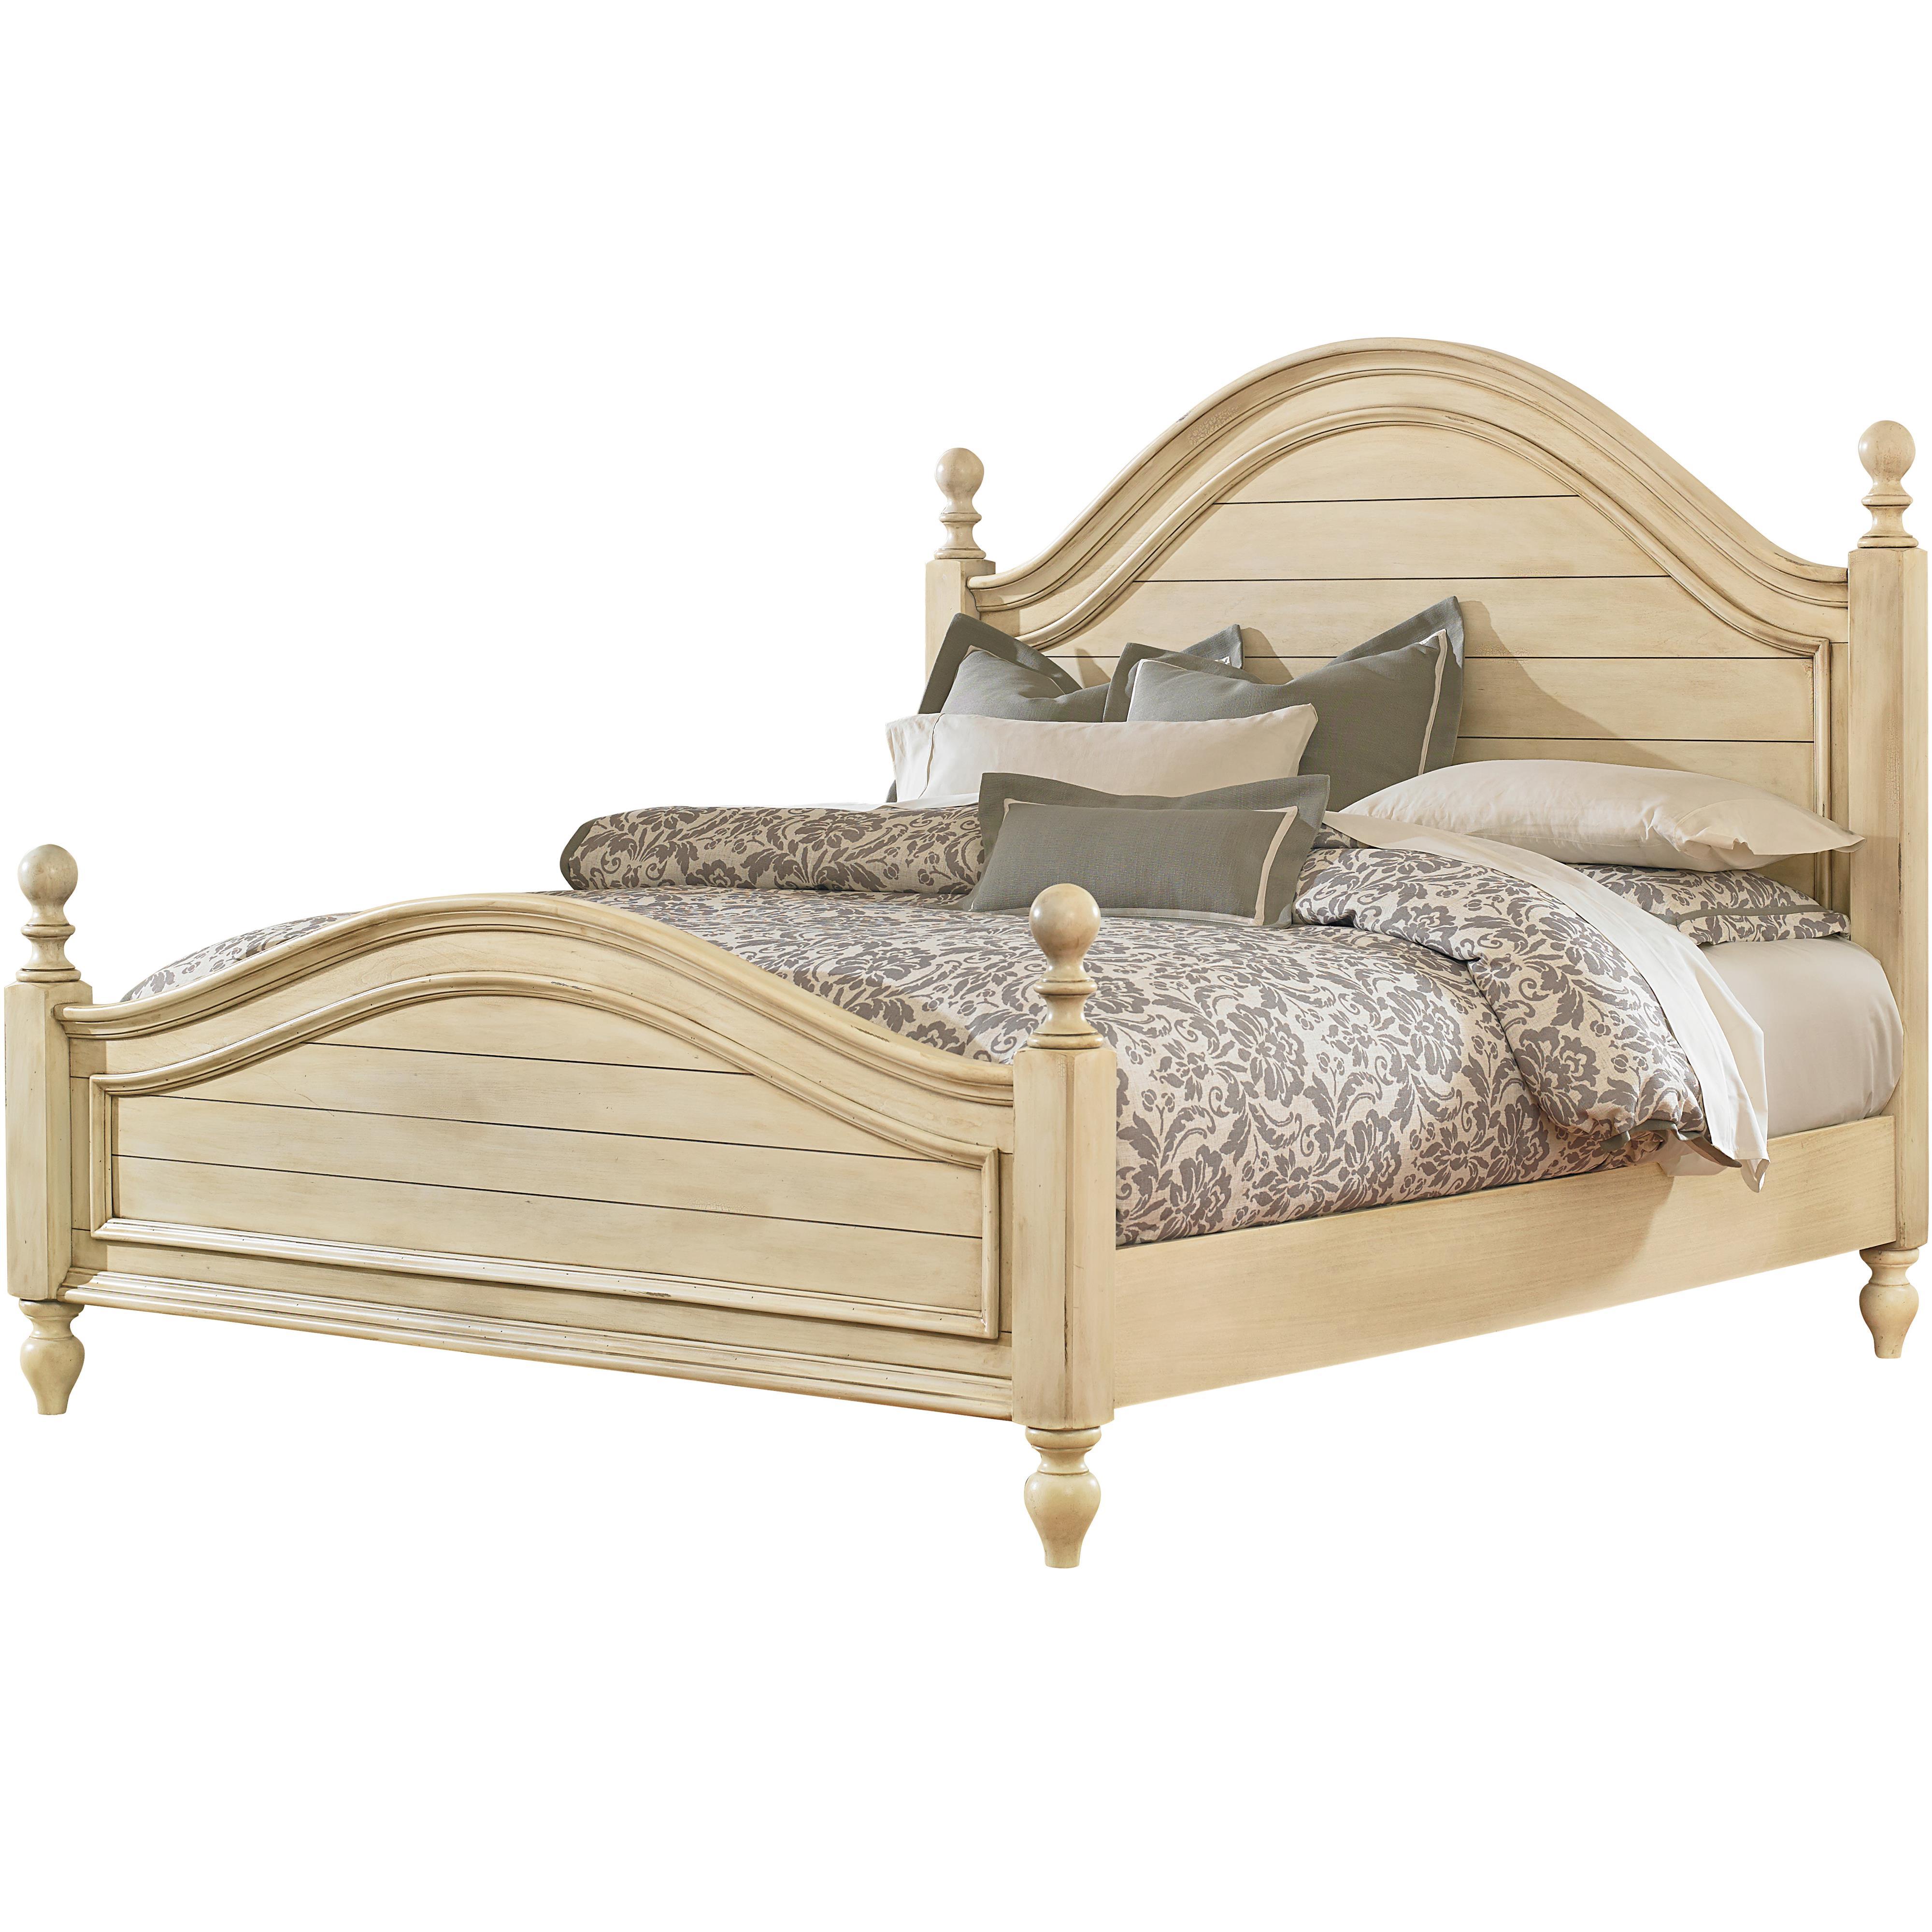 Standard Furniture Chateau King Bed - Item Number: 82863+82861+82852